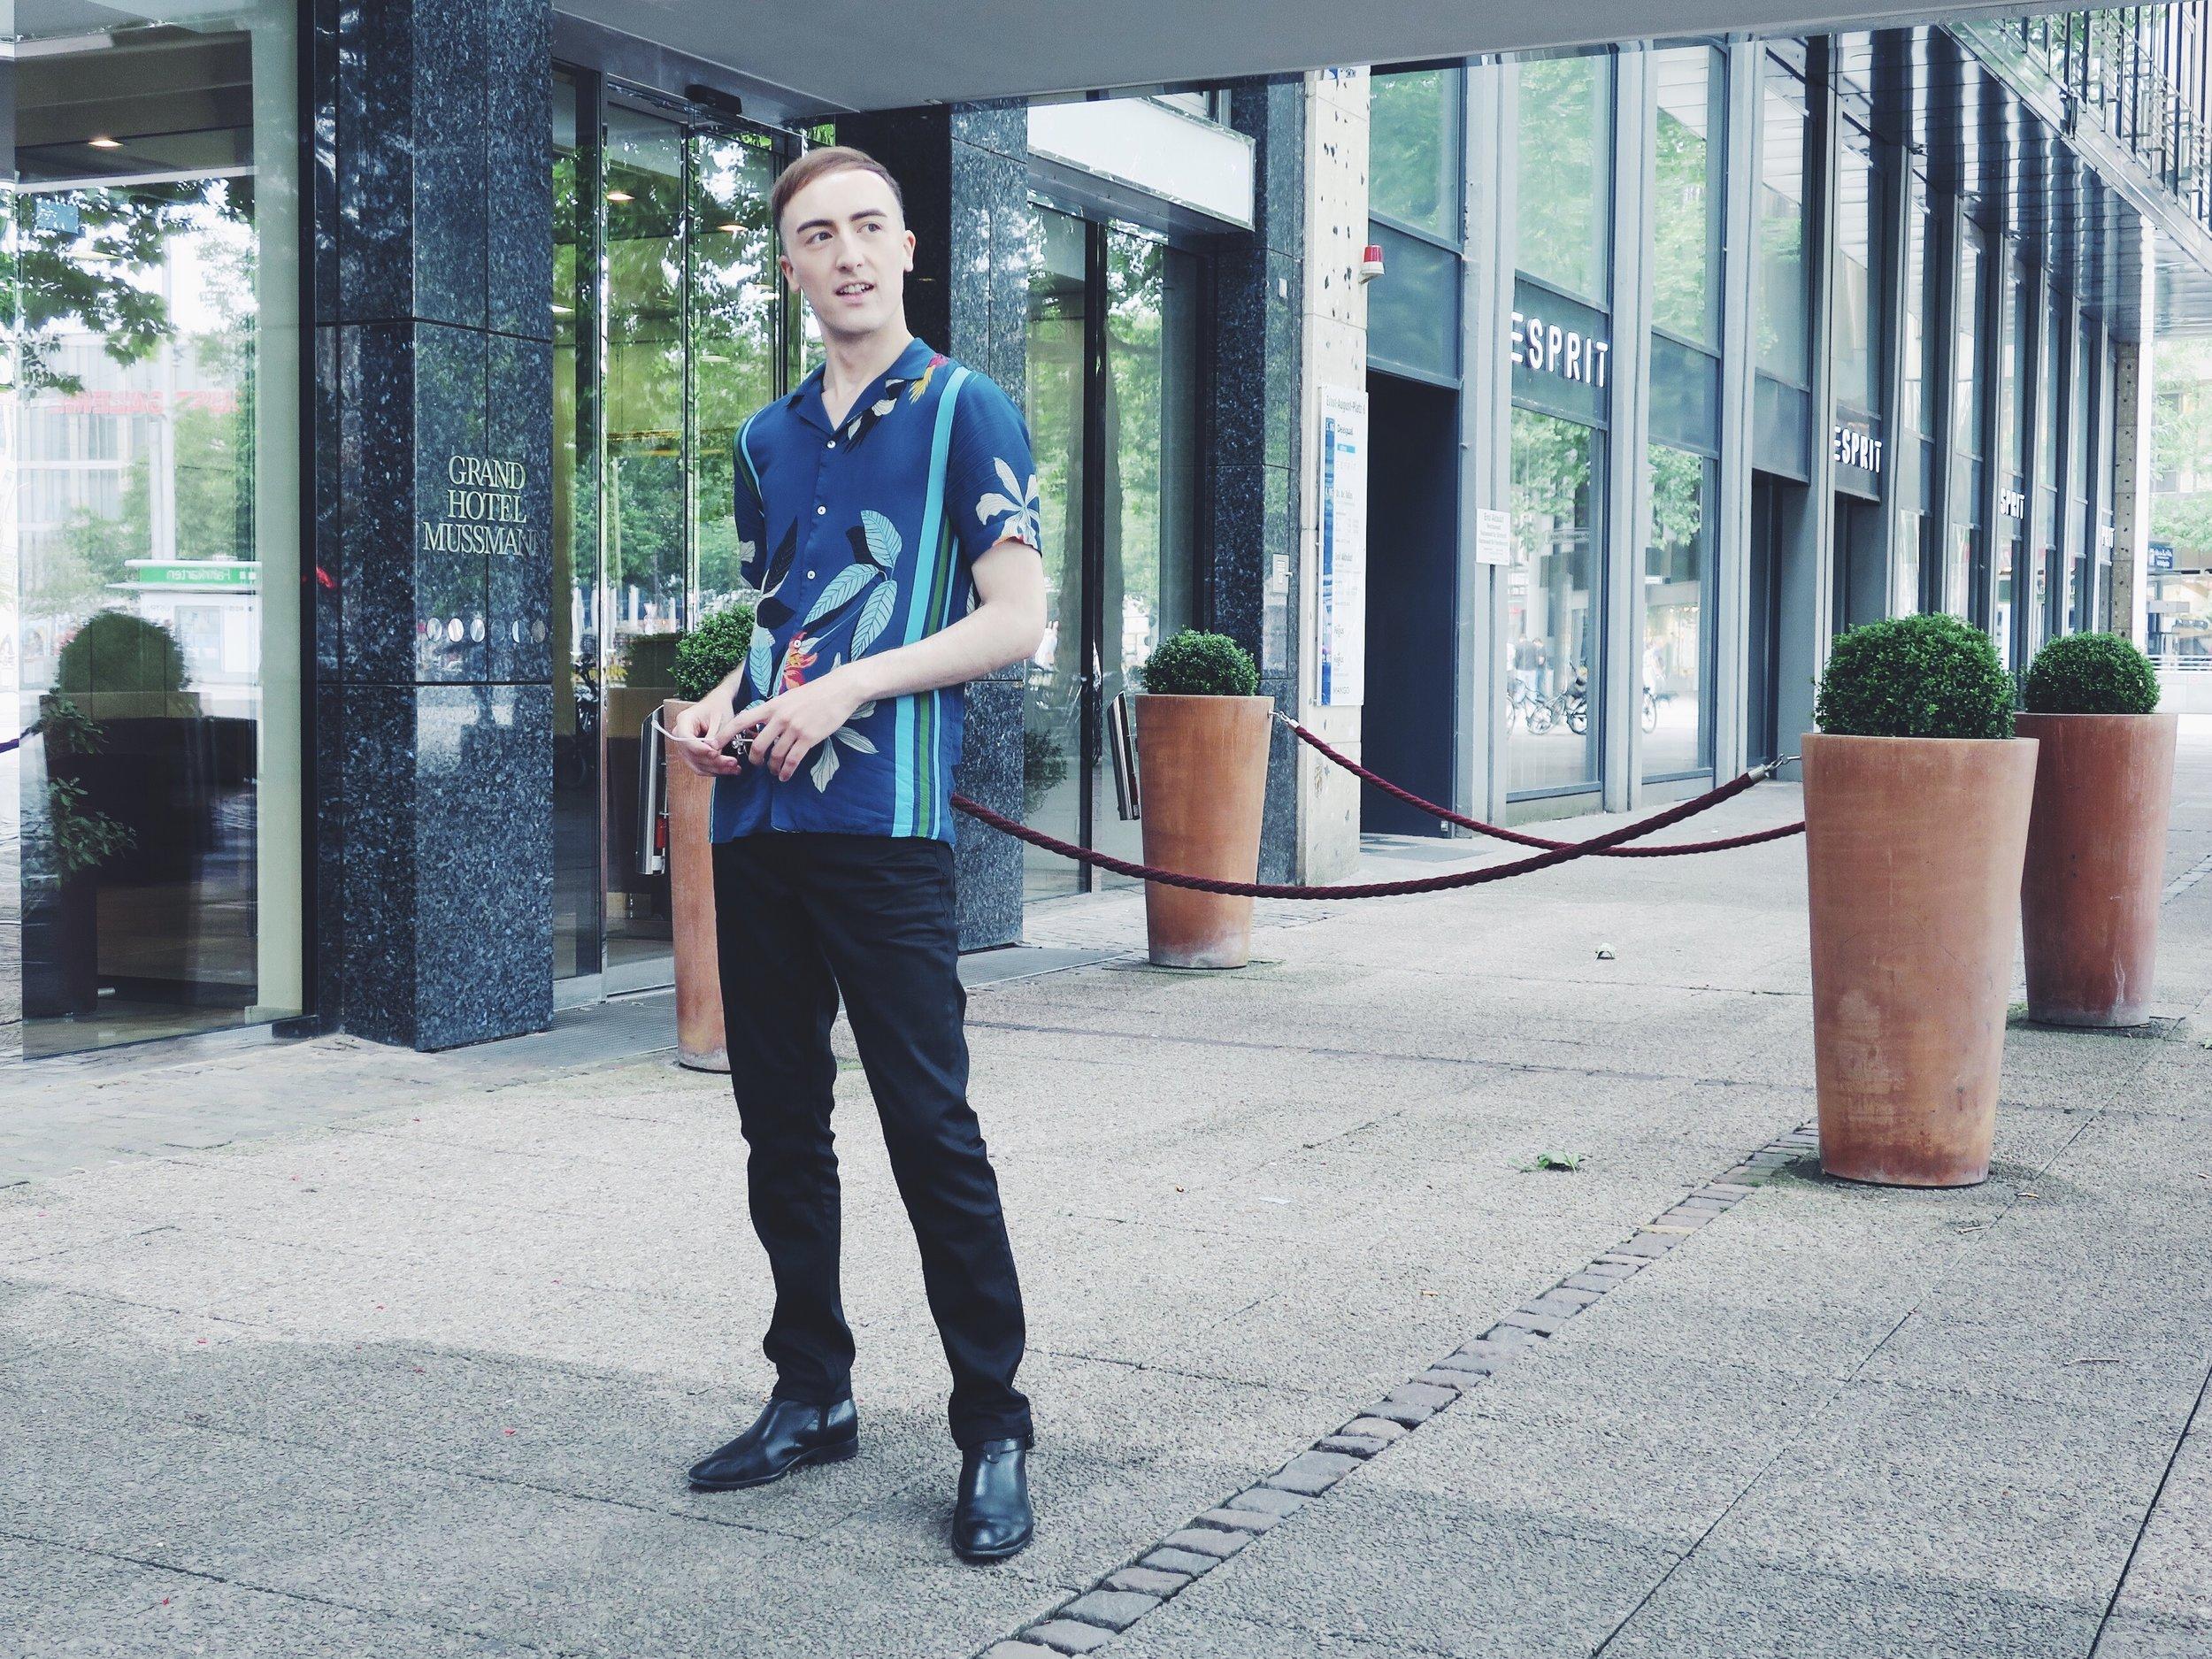 At the Grand Hotel Mussmann,Ernst-August-Platz 7 Wearing Zara shirt - Zara jeans - Sacha ankle boots